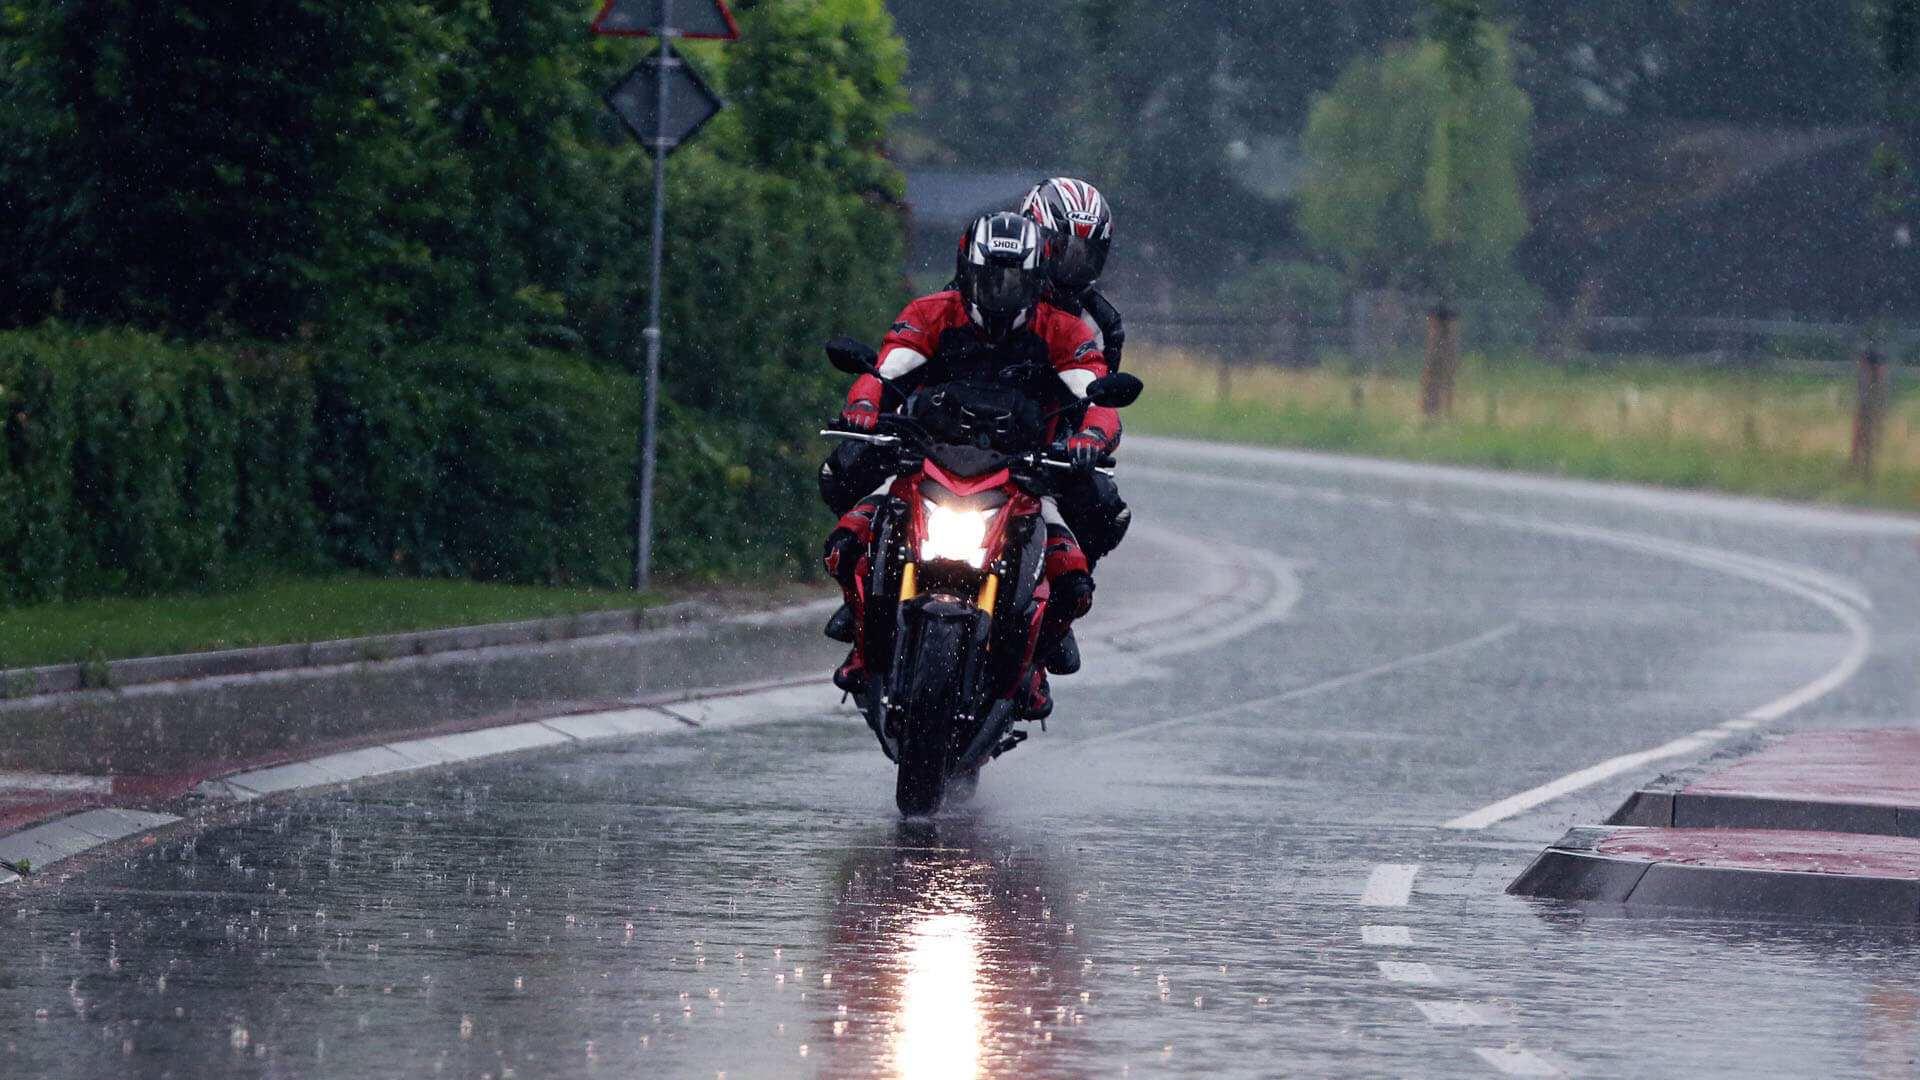 Waterdichte motorkleding